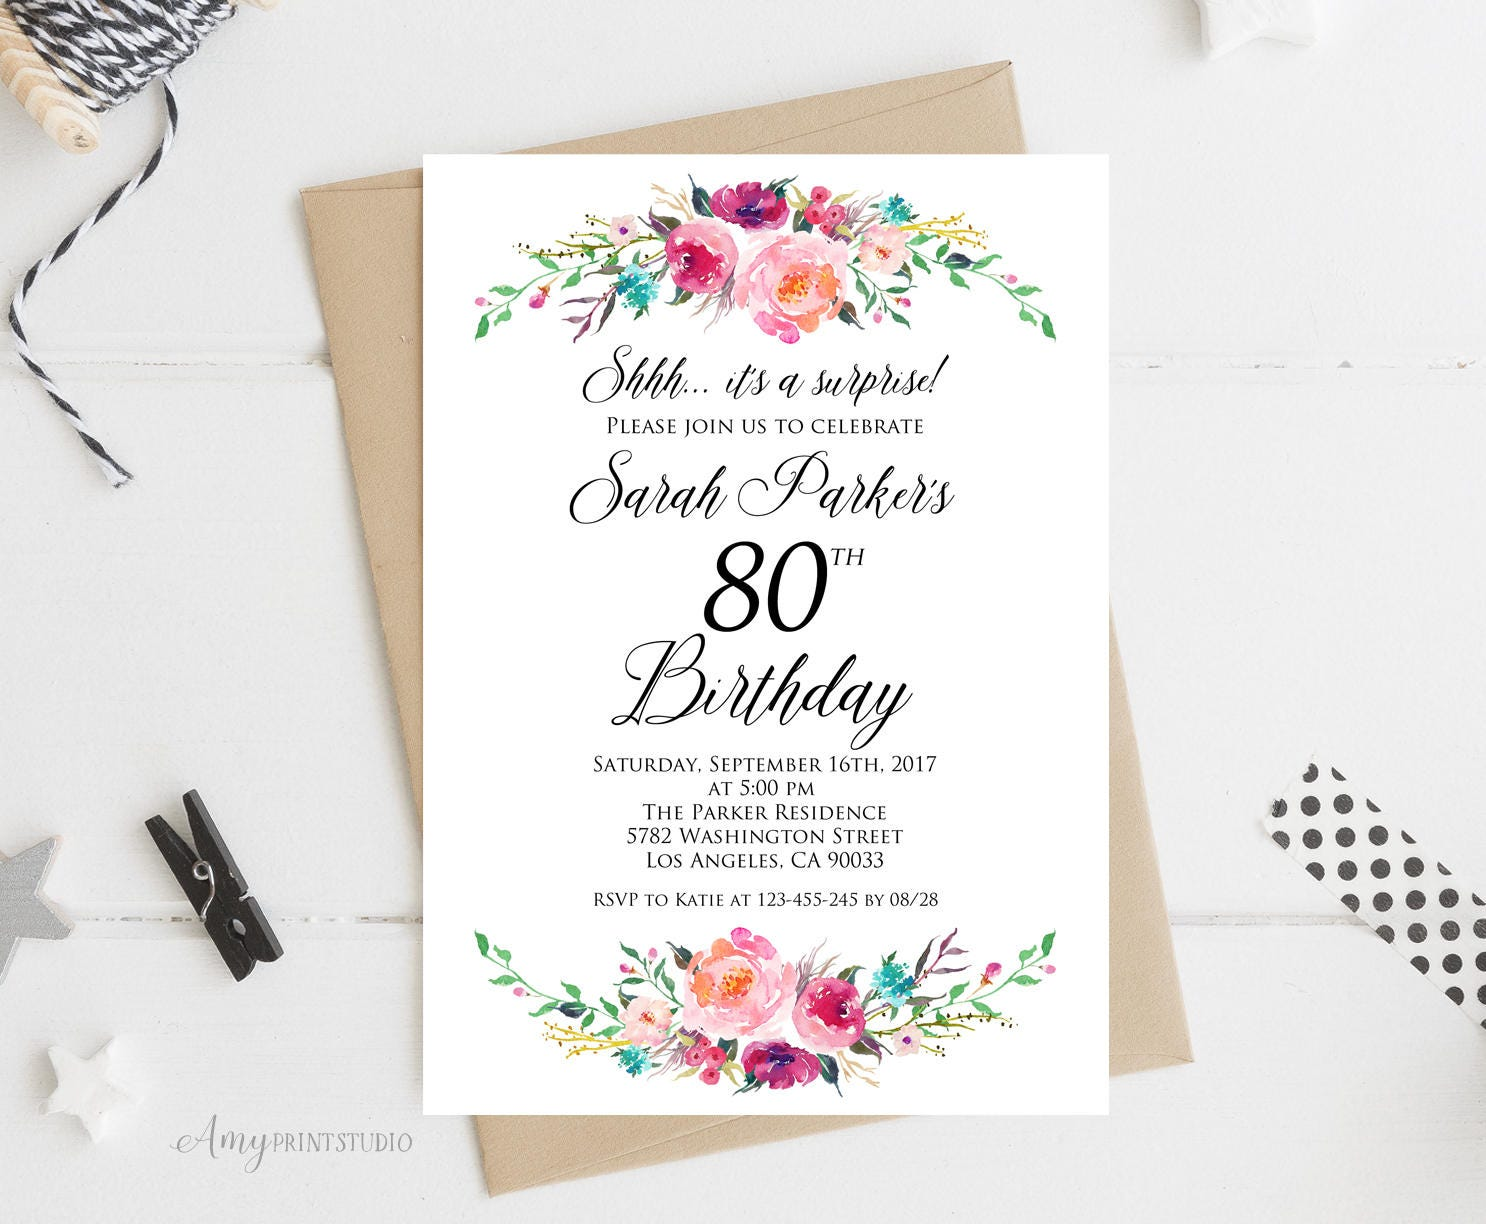 Surprise 80th Birthday Invitation Floral Birthday Invitation | Etsy